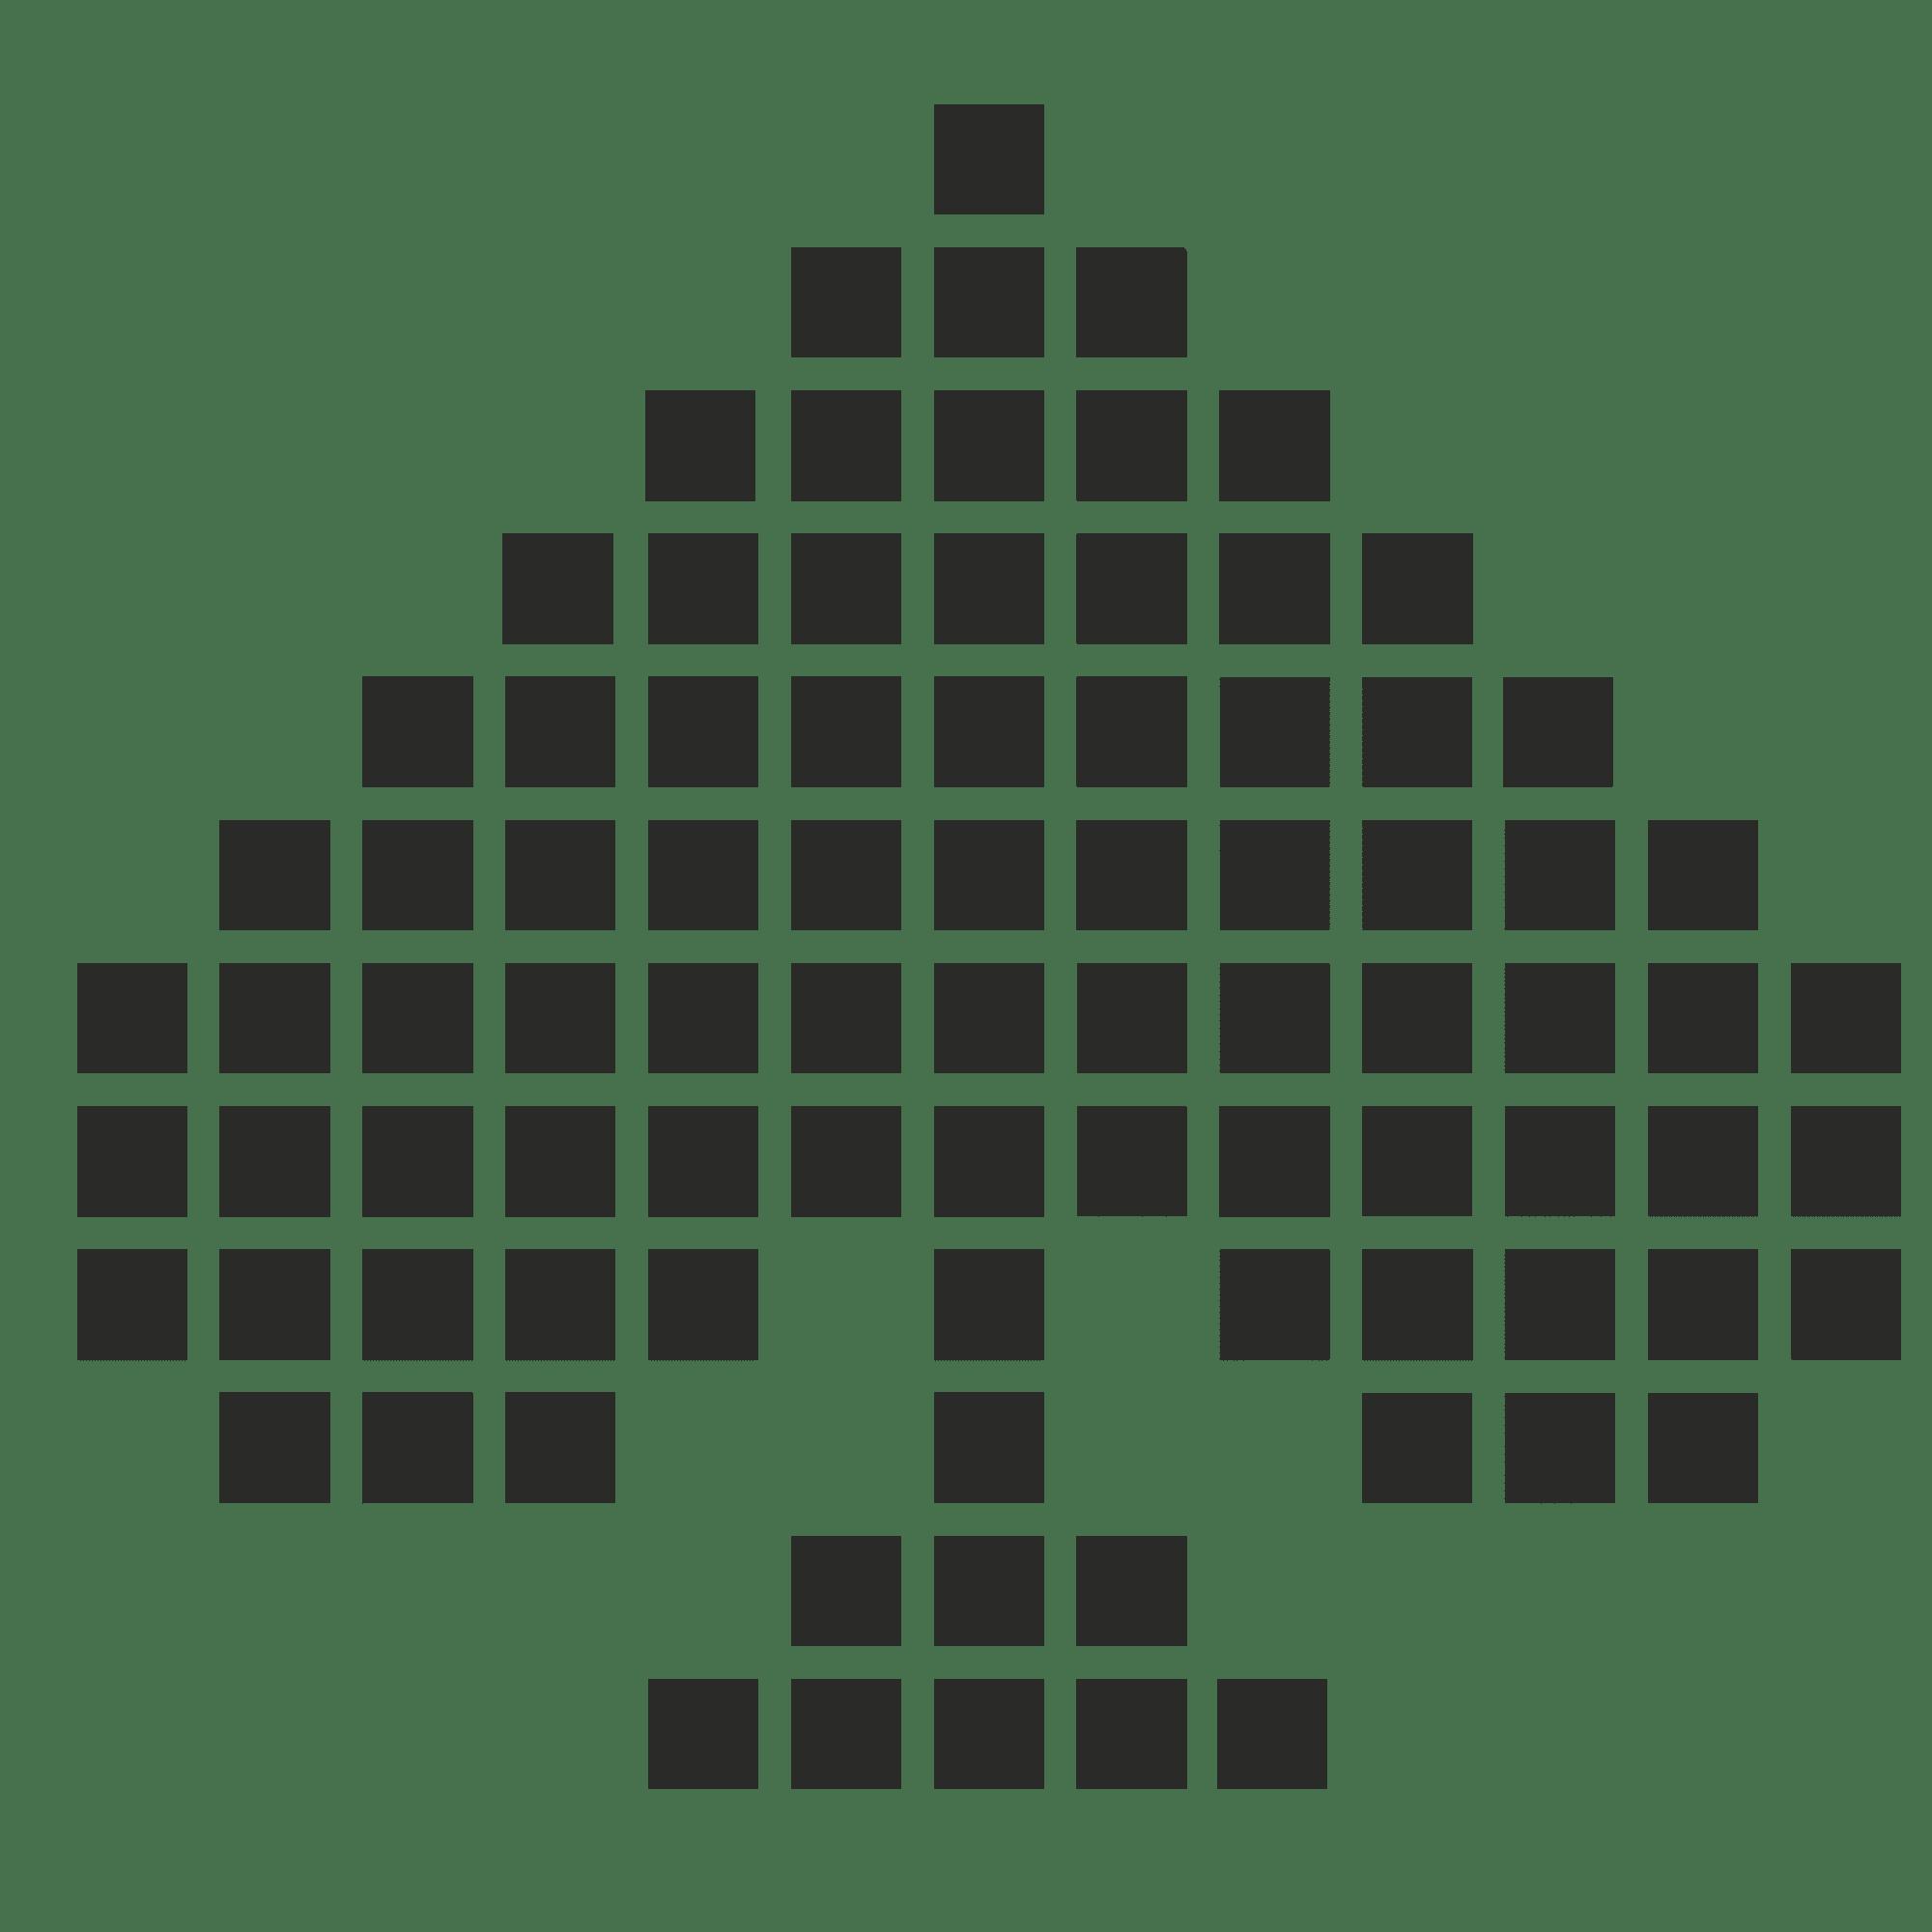 Markus-Toegel-PiKSEL-grafik-web-design